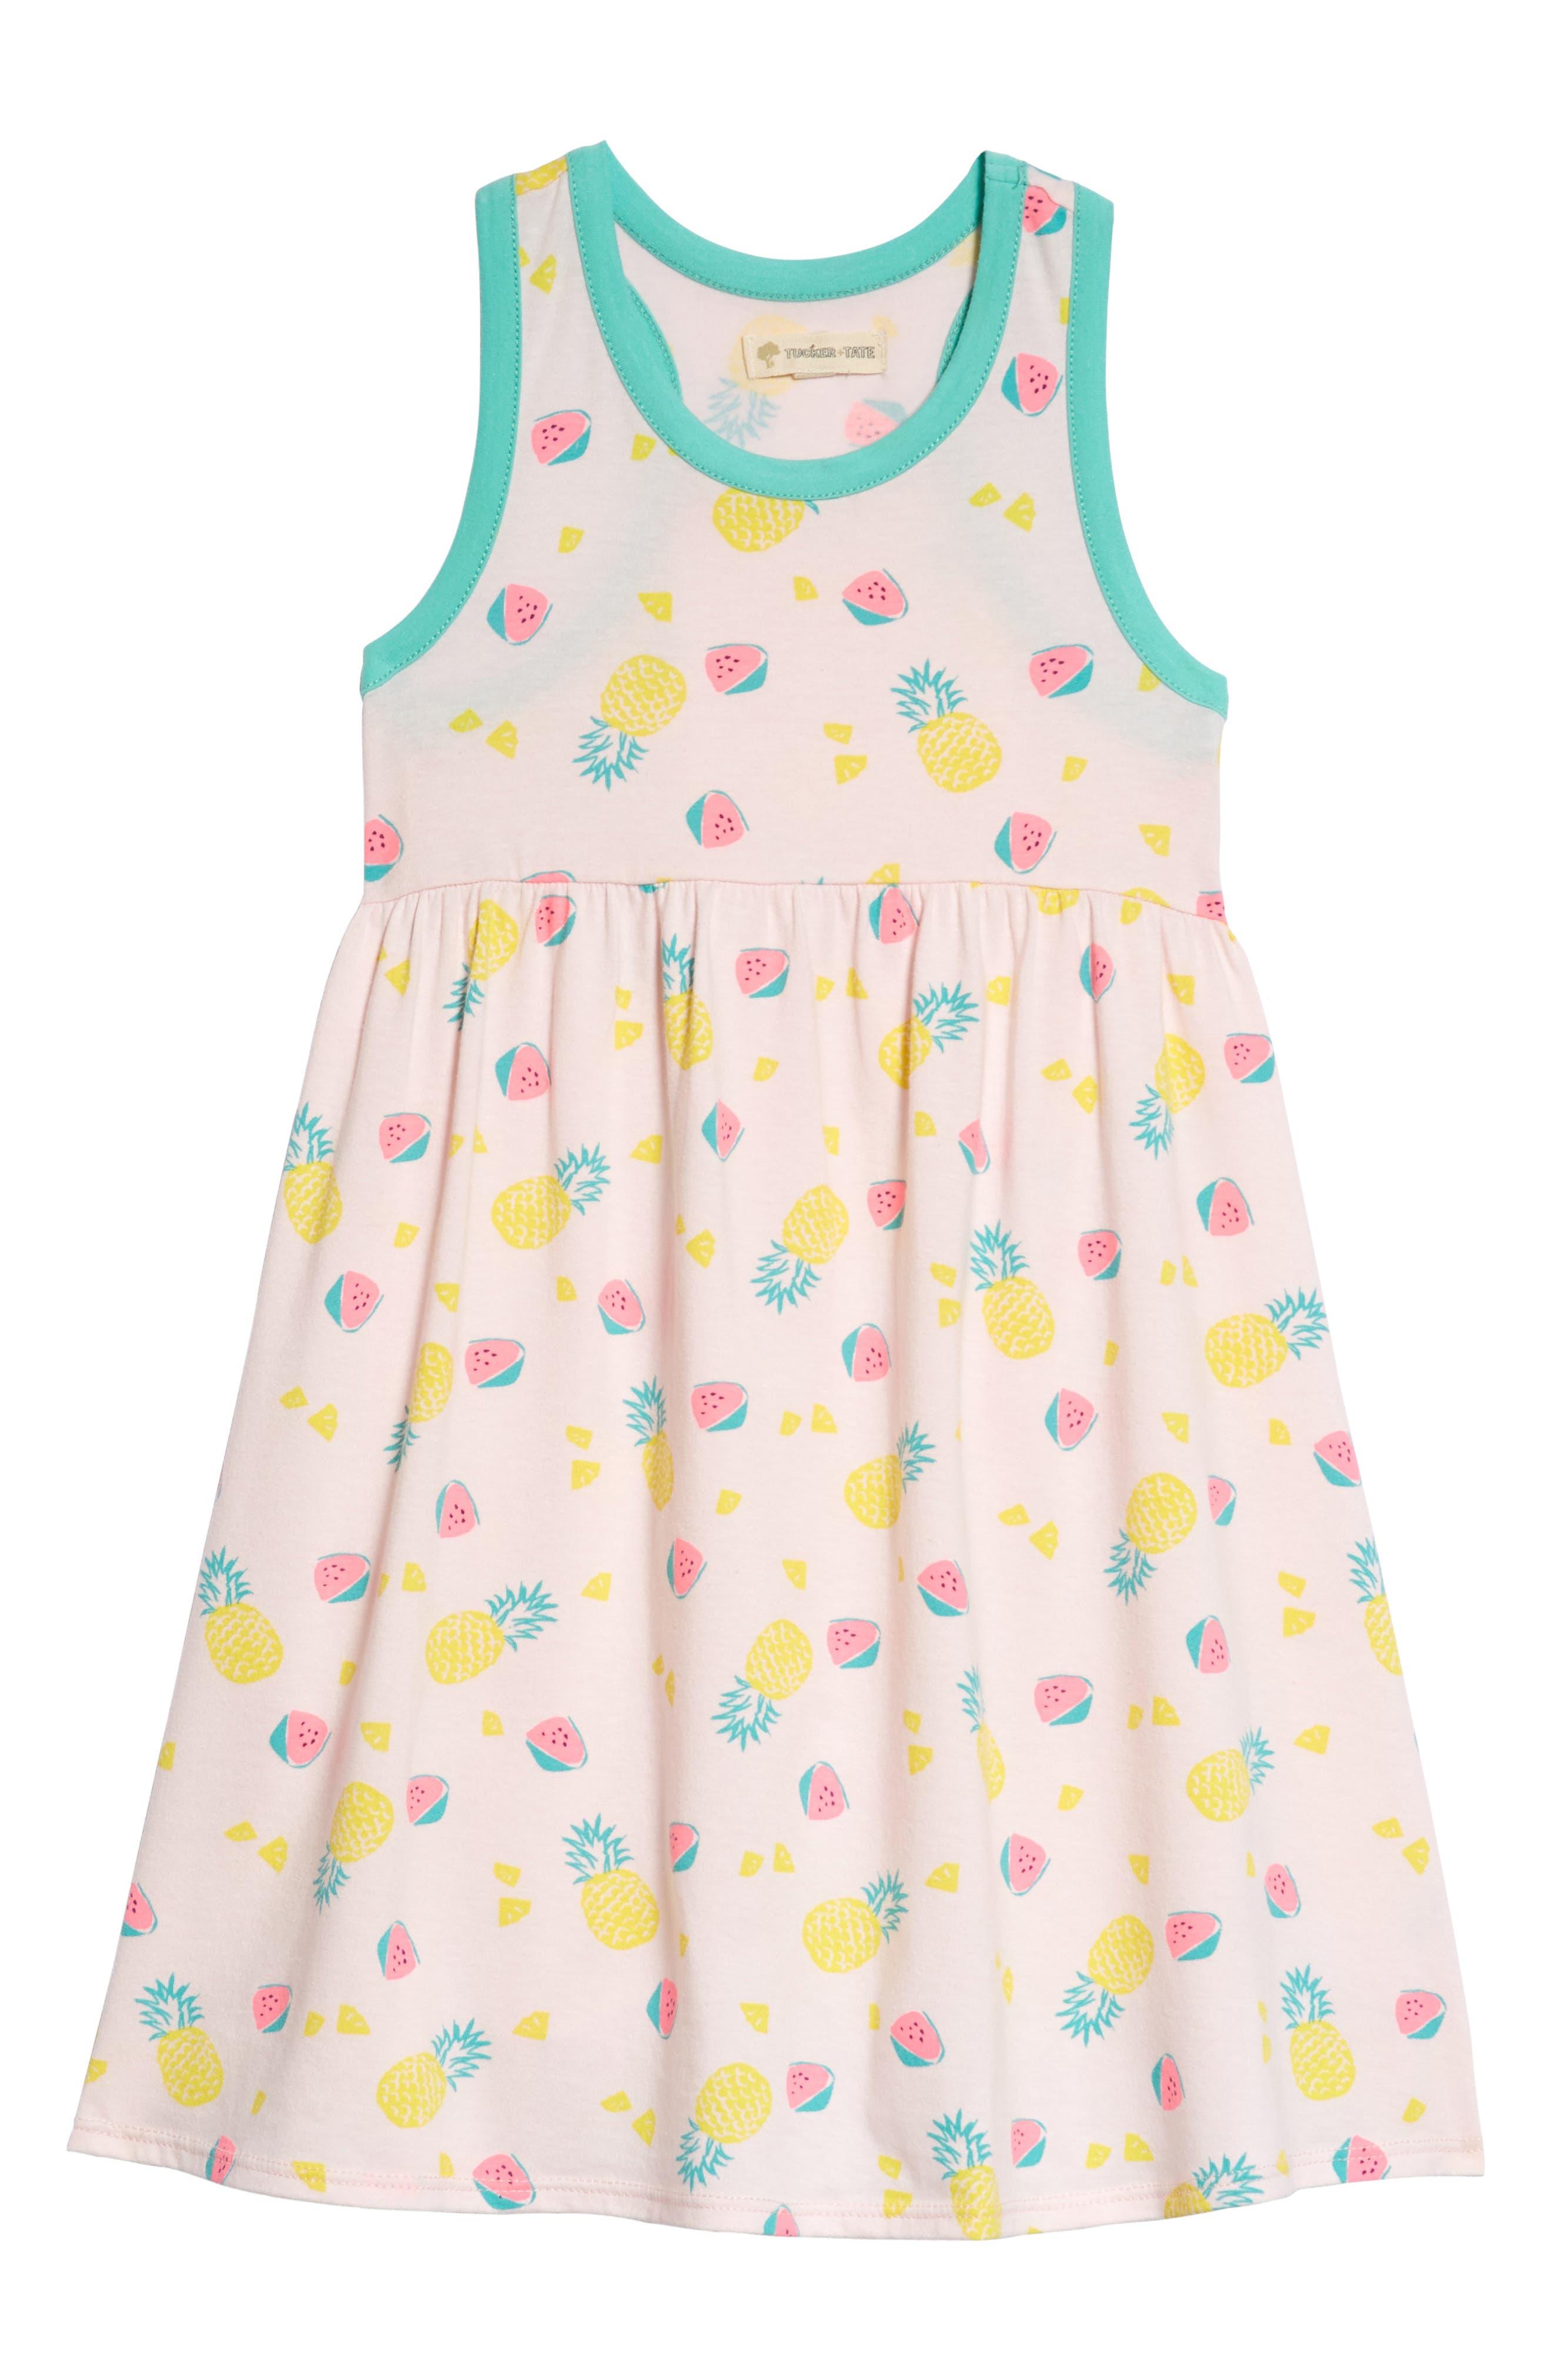 Racerback Tank Dress,                             Main thumbnail 1, color,                             Pink Breath Fruits